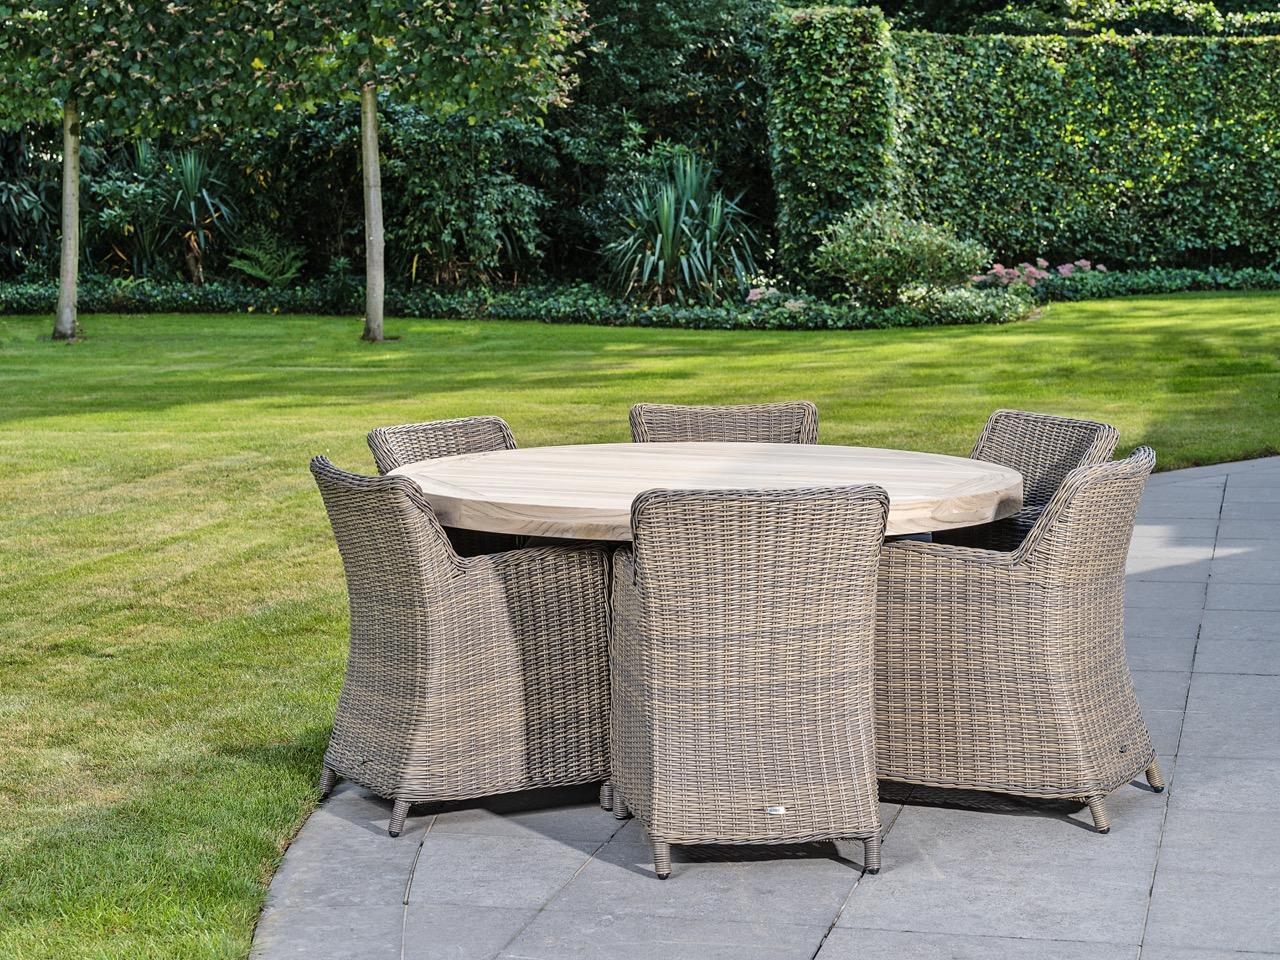 Hedendaags Riva tafel 6 personen | Teak Deco HB-28